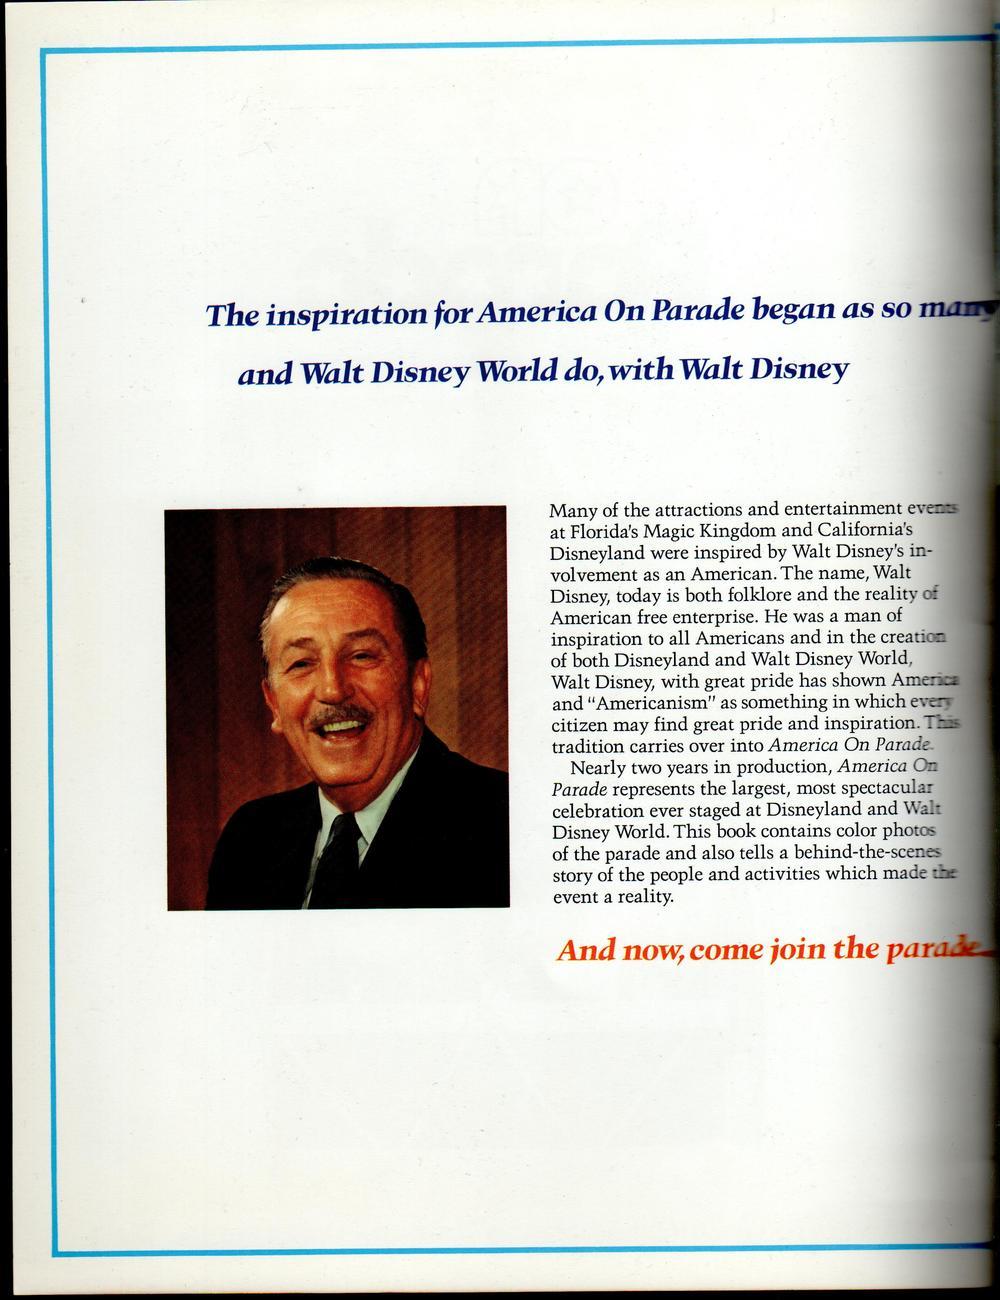 America On Parade A Salute ... A Celebration at Disneyland & Walt Disney World